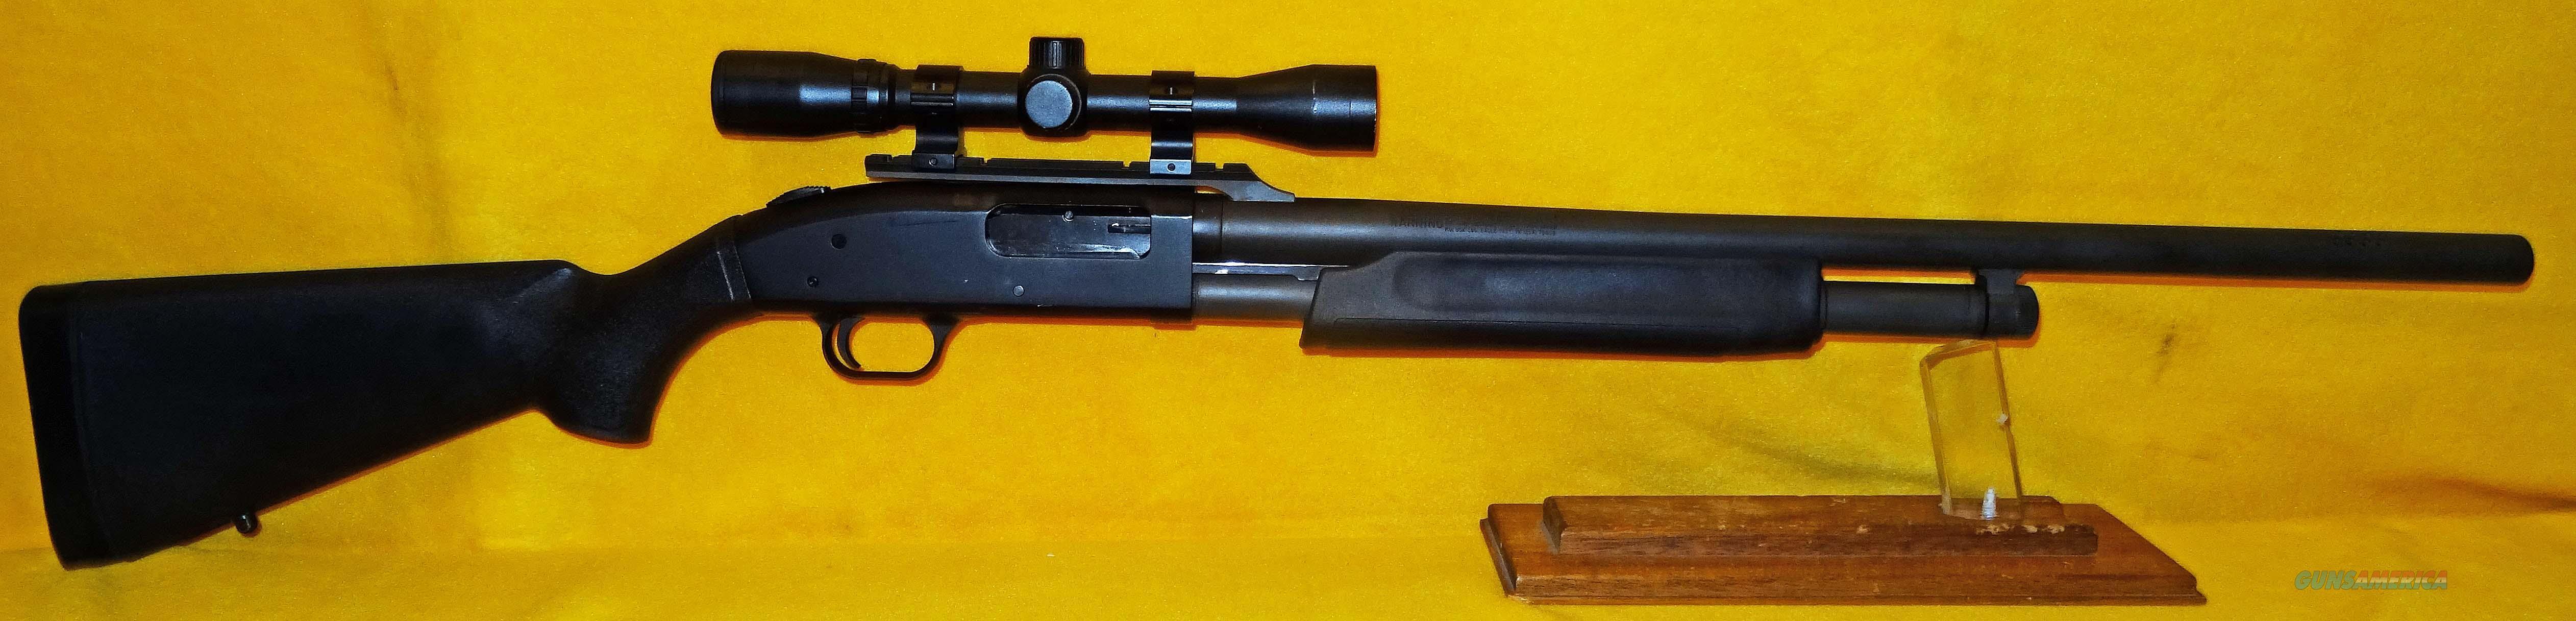 MOSSBERG 500A  Guns > Shotguns > Mossberg Shotguns > Pump > Sporting